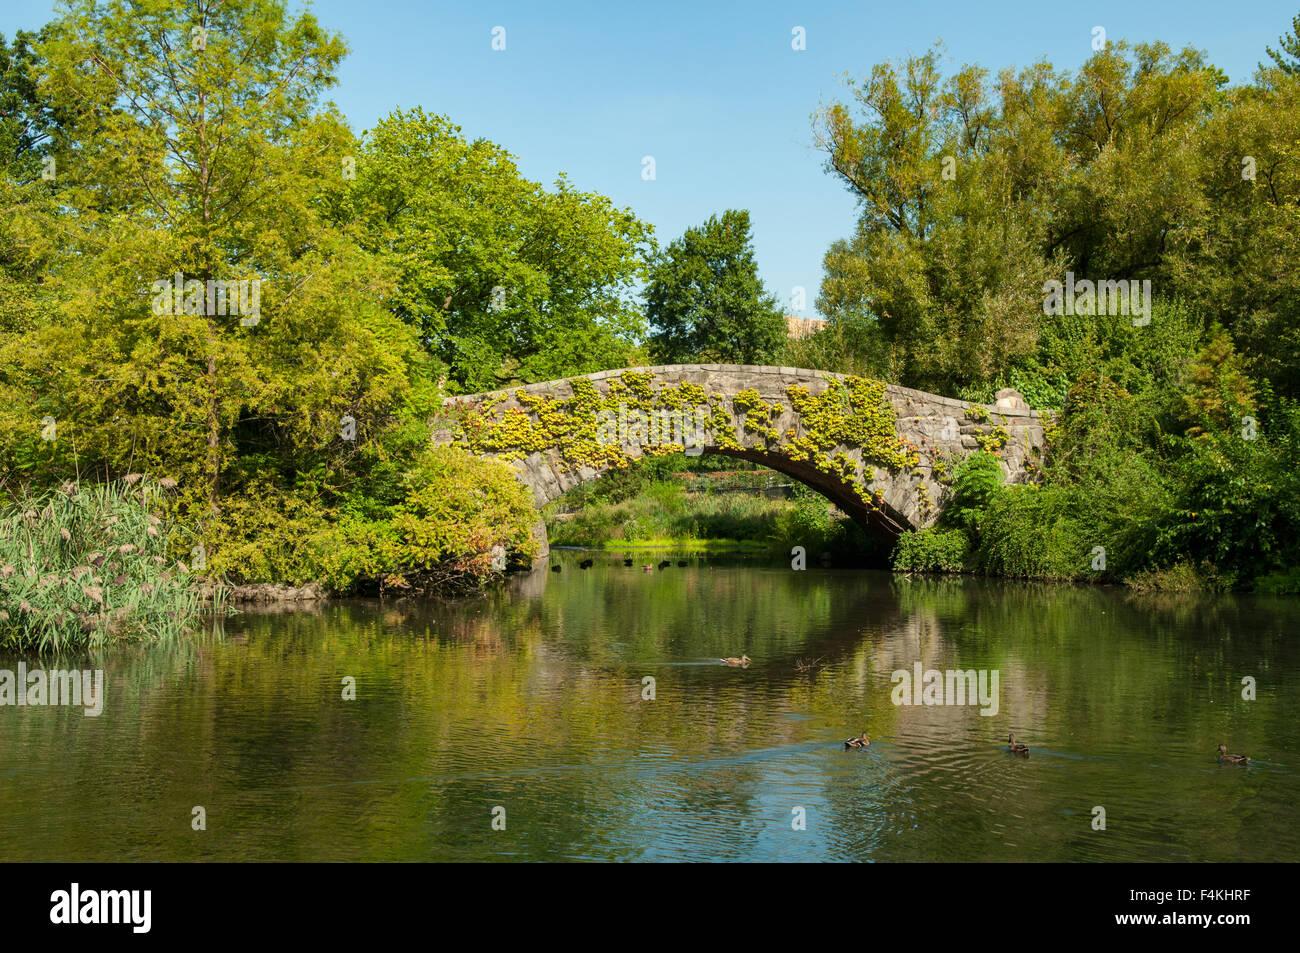 Gapstow Bridge, Central Park, New York, USA - Stock Image